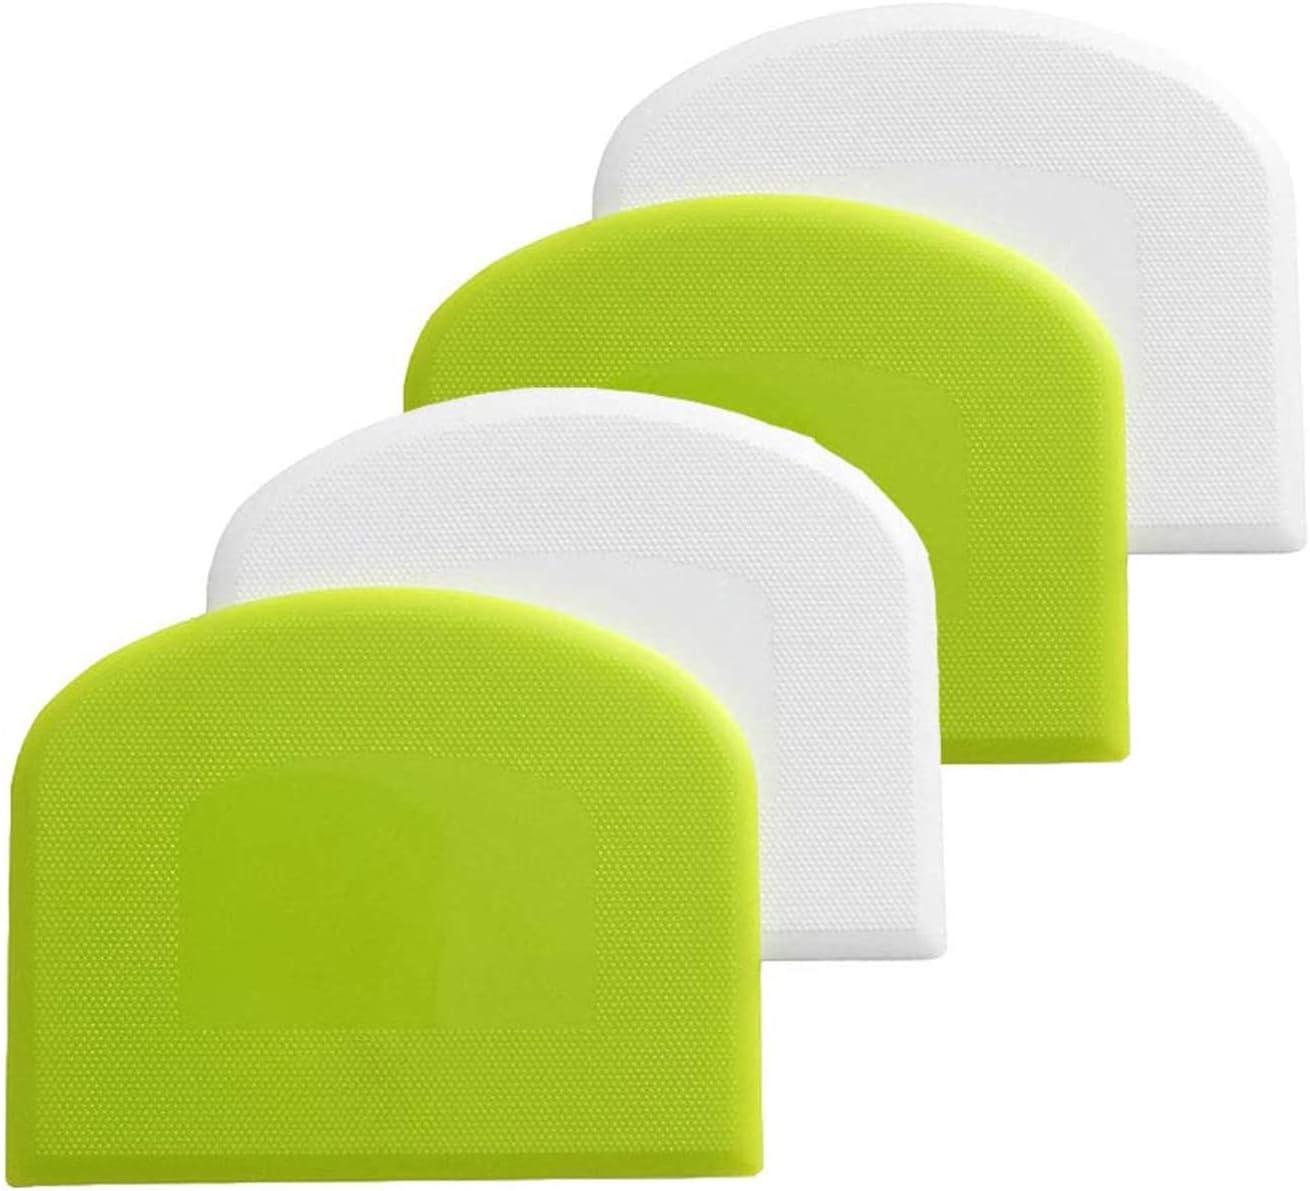 4 Pcs Dough Scrapers Plastic Flexible Bowl Scraper, Food safe Grade Bench Practical Scraper Plastic Multipurpose Dough Cutter for Ice Cream, Bread, Cake, Fondant, Pizza (2 Green + 2 White)